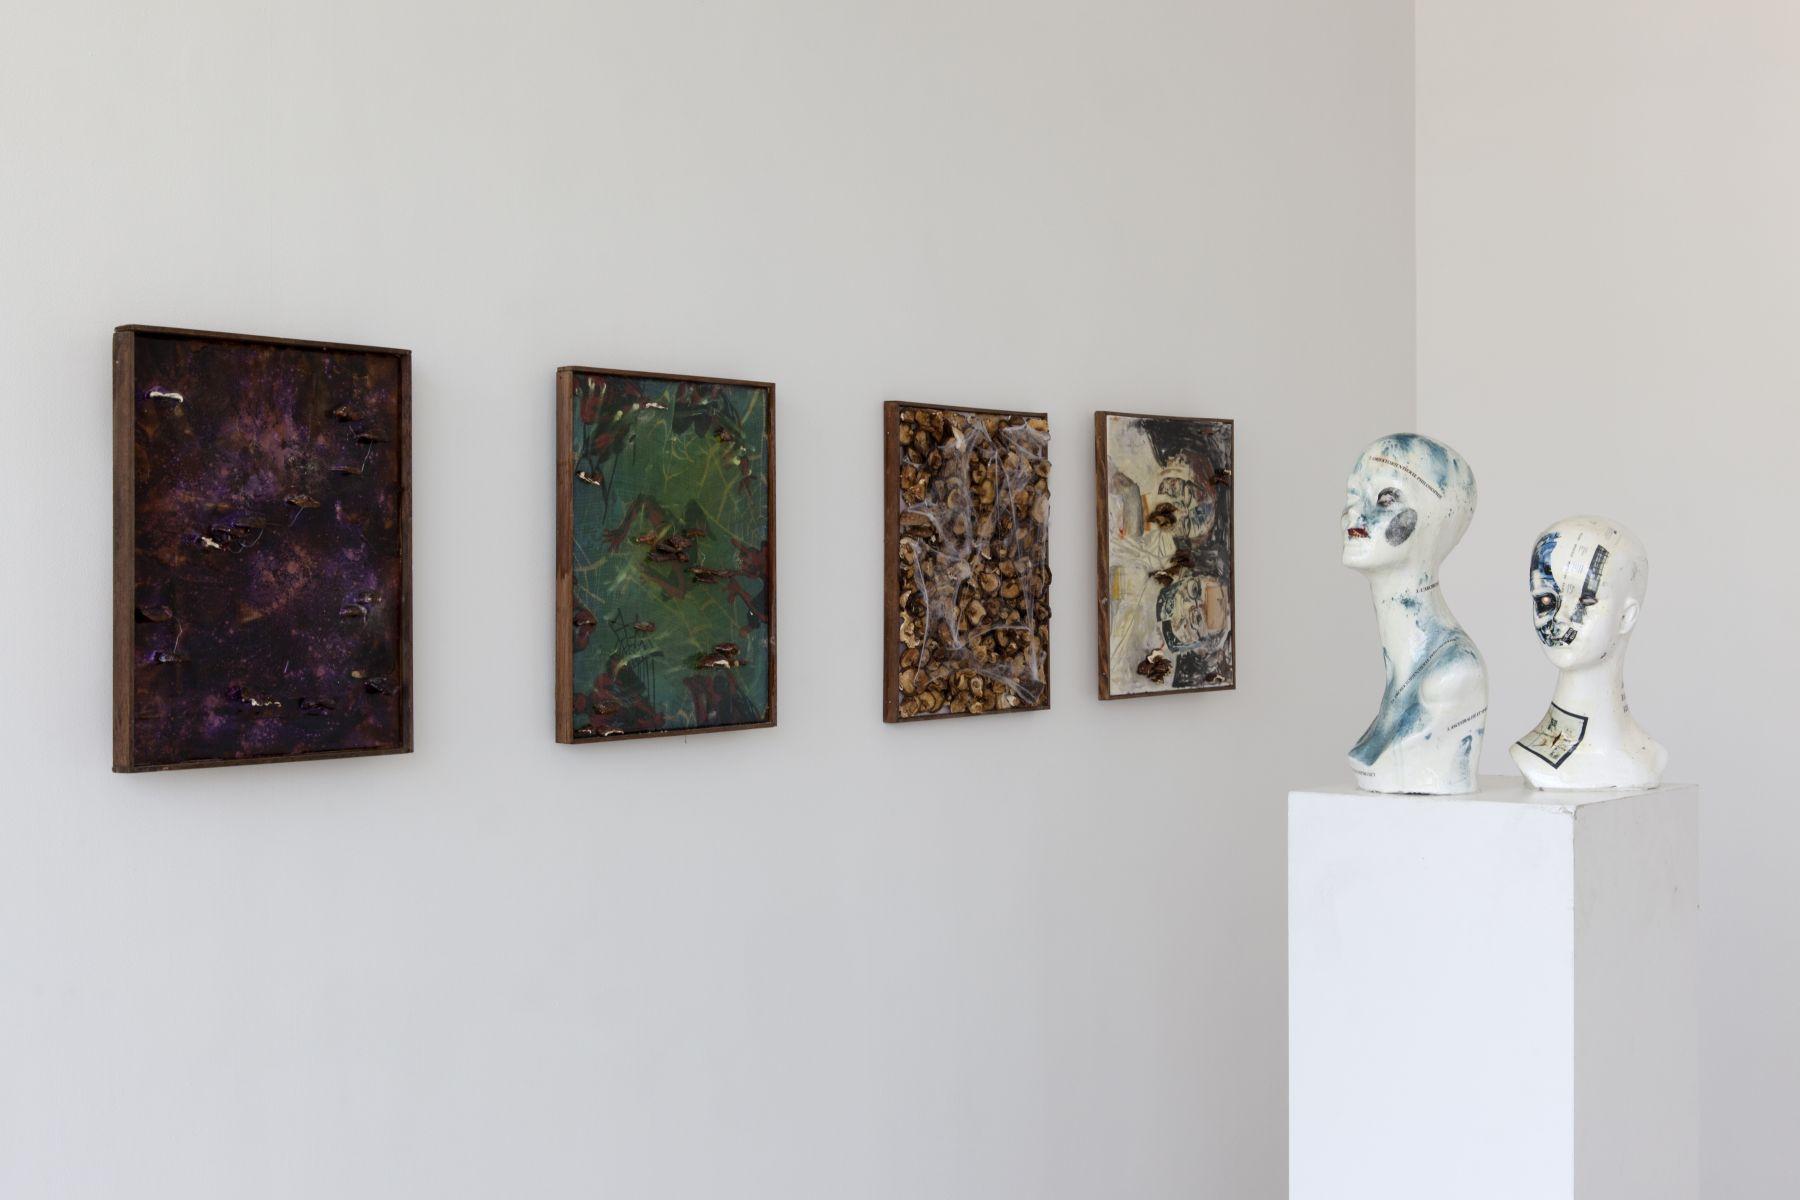 Installation view, SIDE SHOW, Greene Naftali, New York, 2012